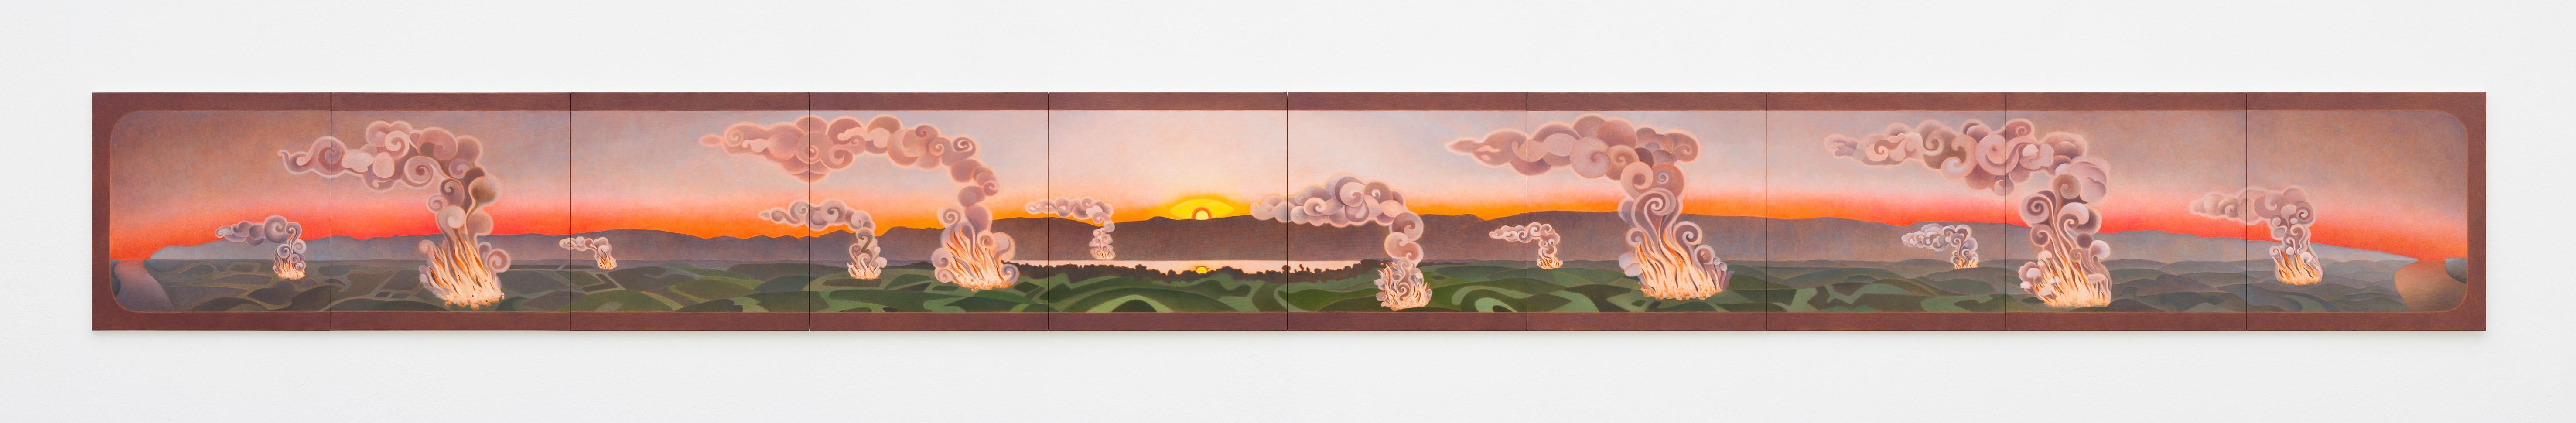 "Gemälde ""58 av. J.-C."" von Caroline Bachmann"